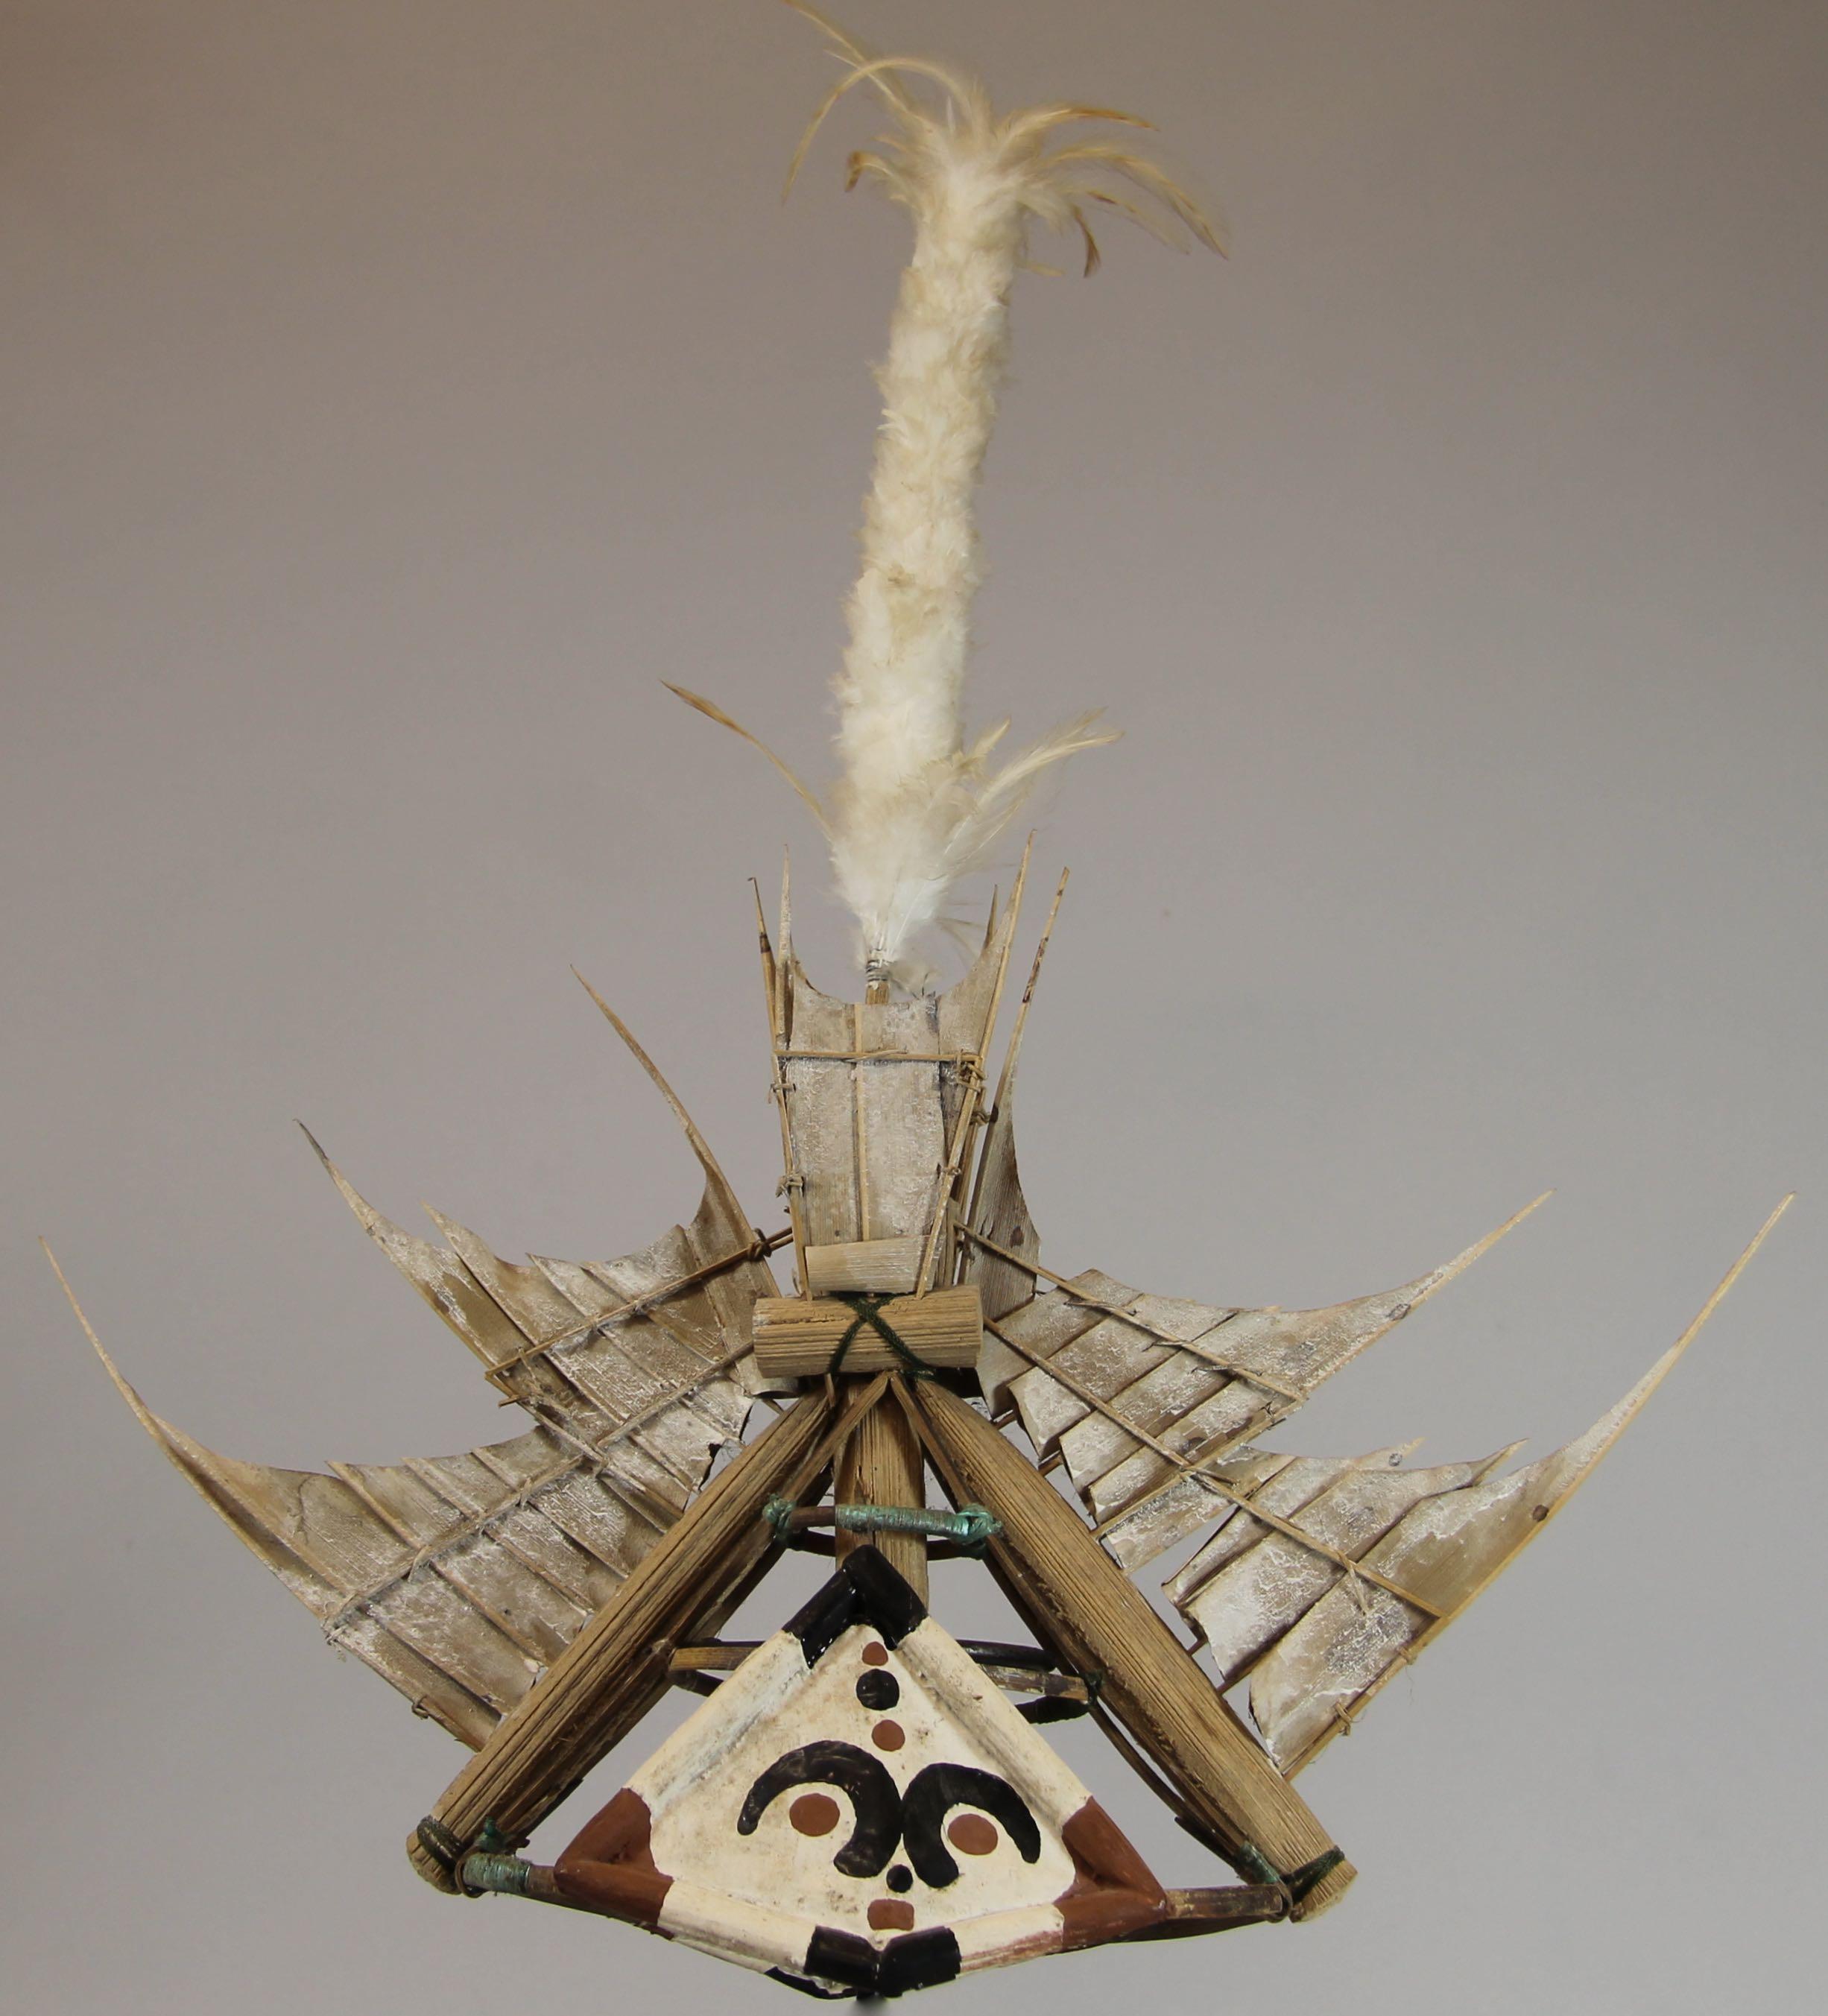 Ceremonial dance headdress